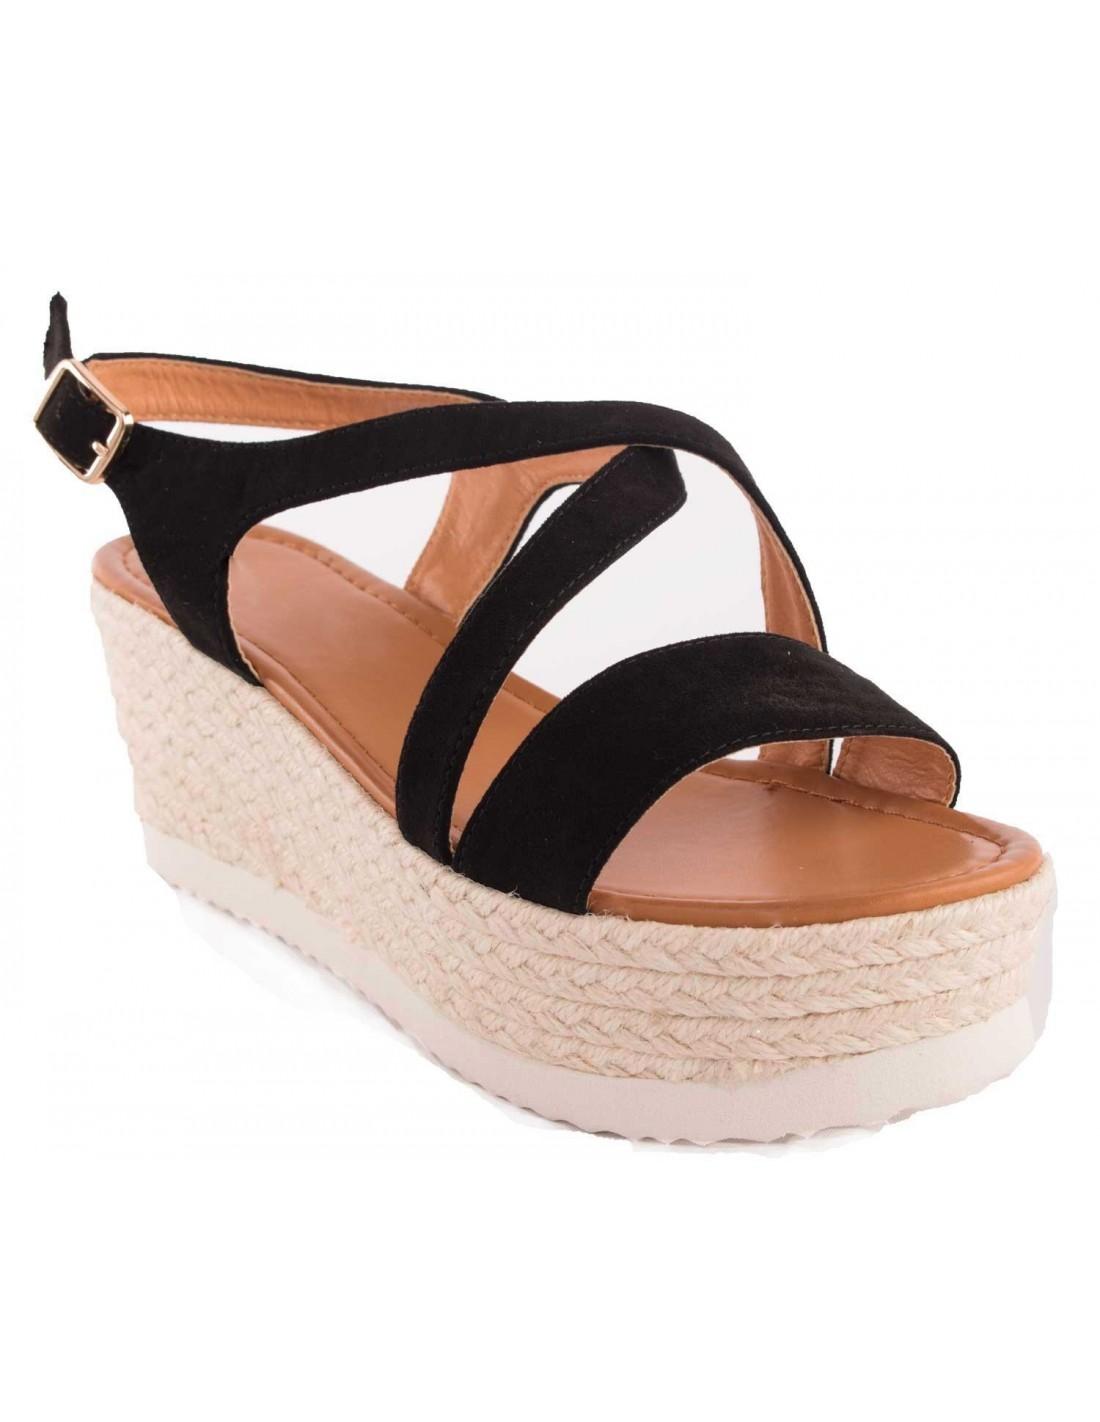 sandales plateforme compens e noir su dine talon corde ouverte. Black Bedroom Furniture Sets. Home Design Ideas